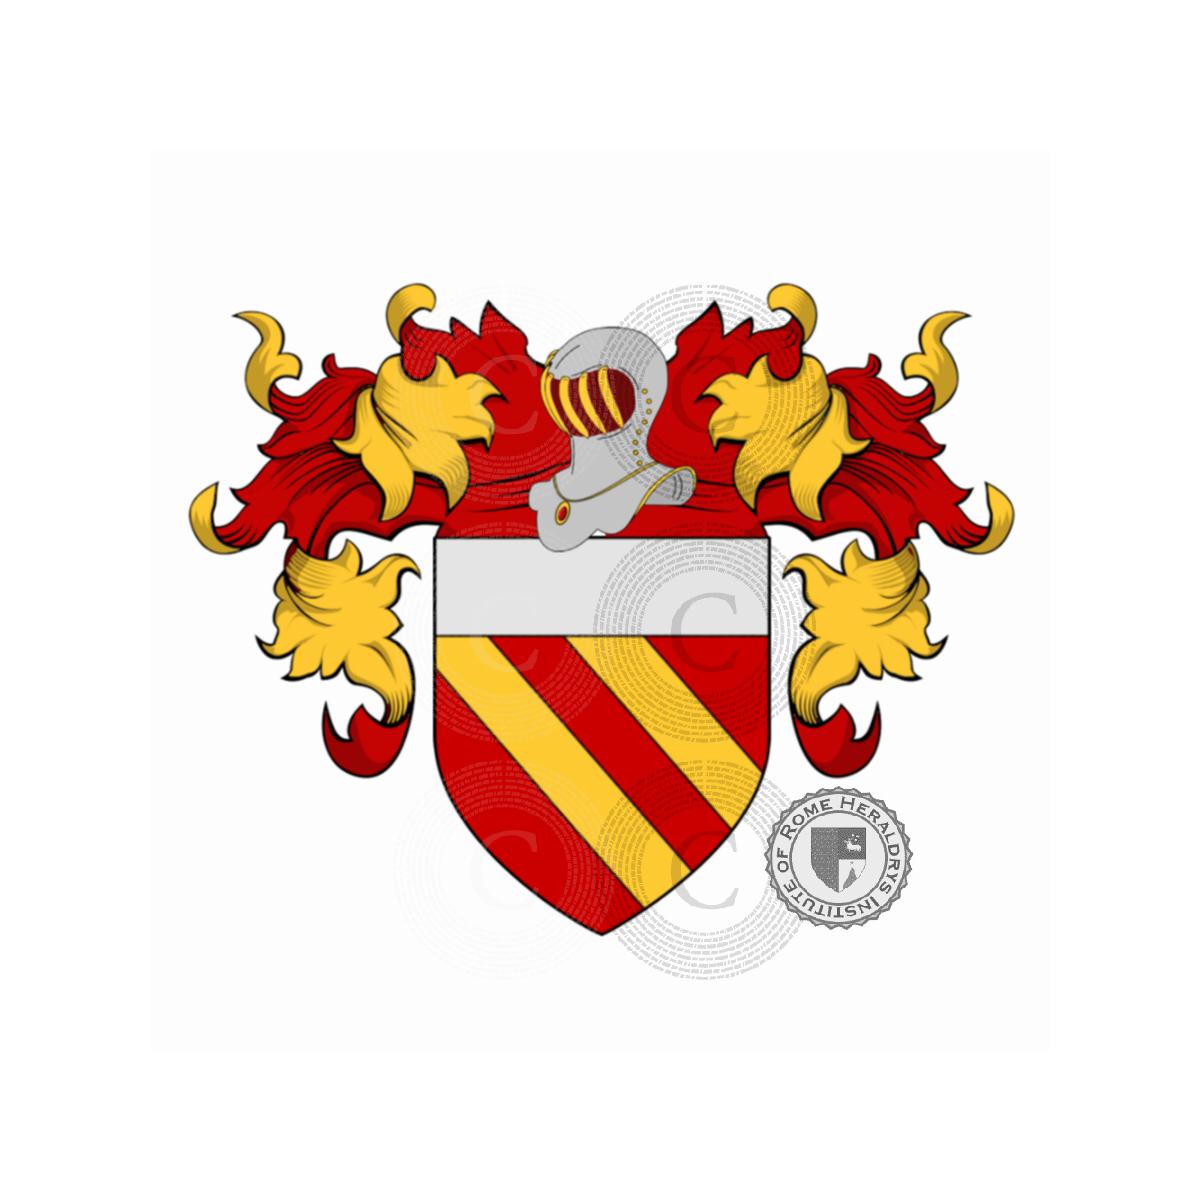 Familienname Melo Heraldik Genealogie Wappen Und Herkunft Des